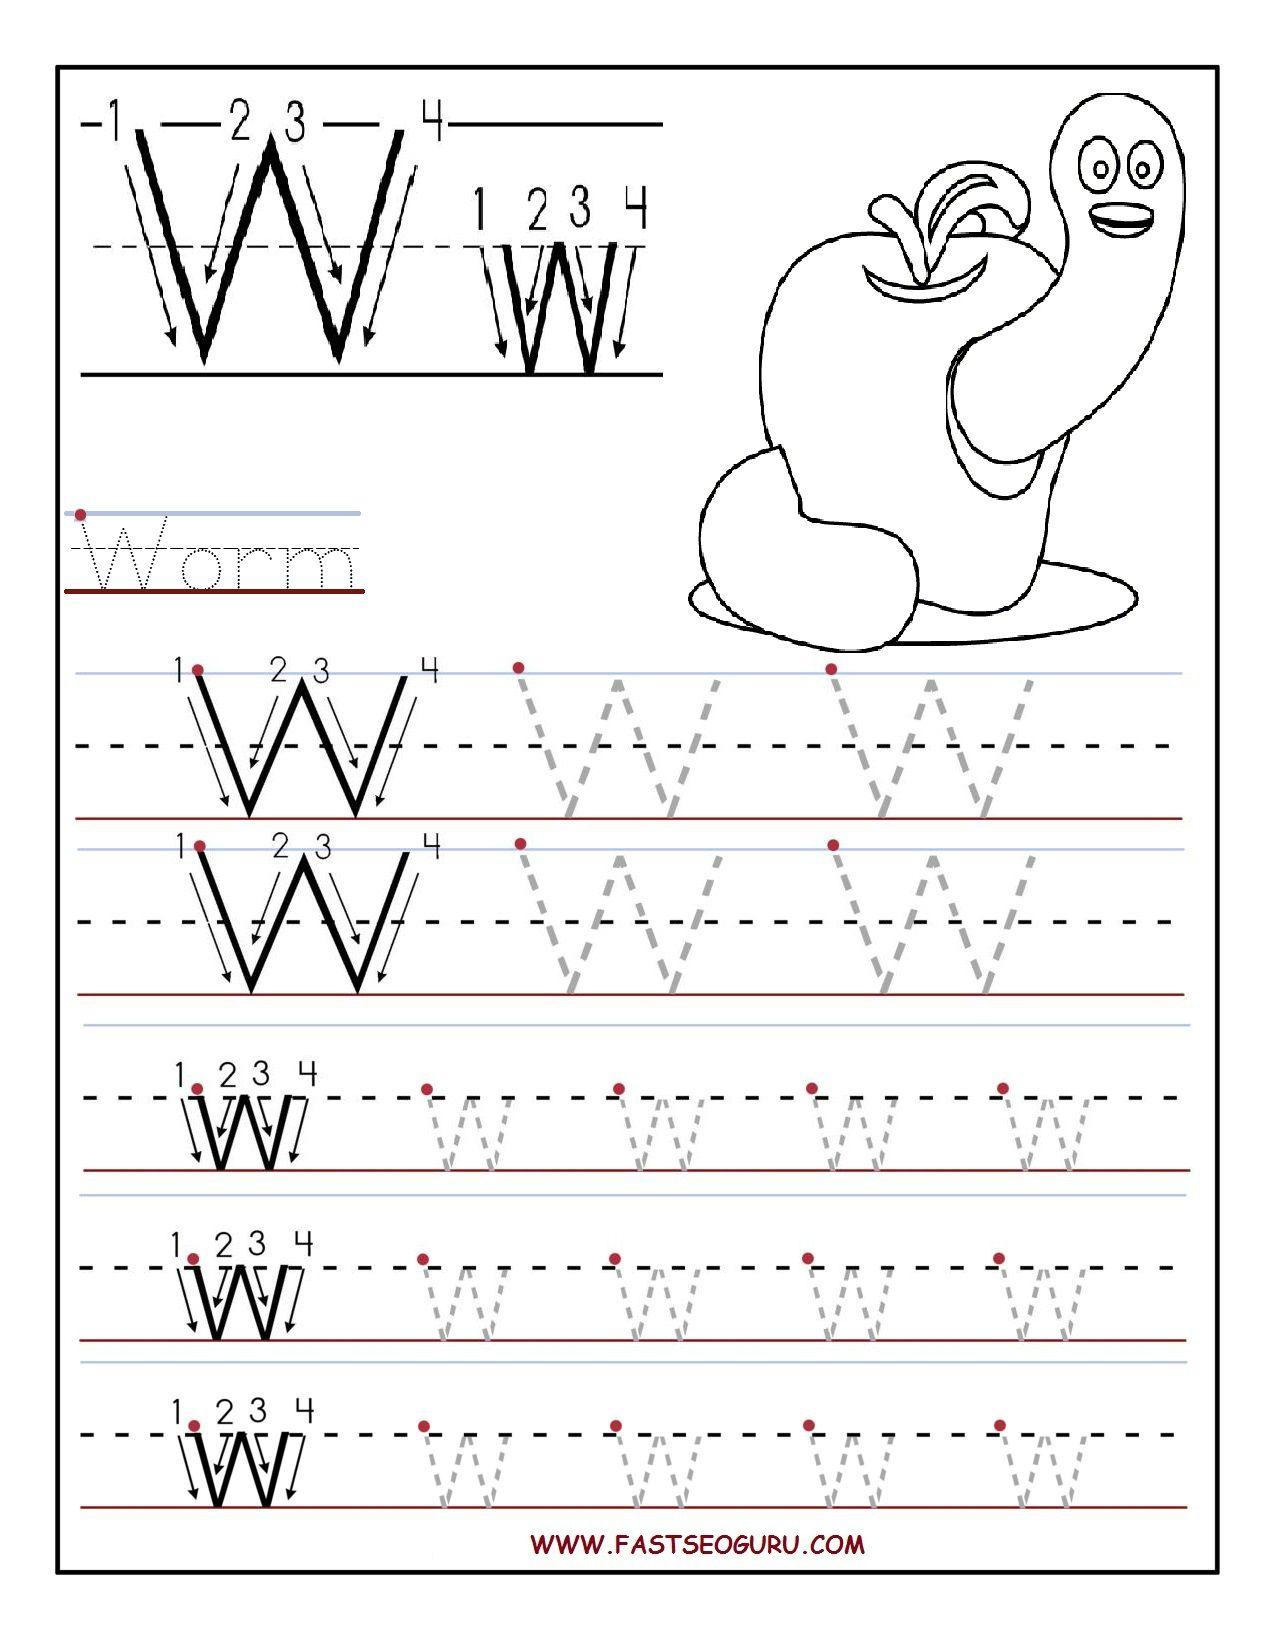 Printable Letter W Tracing Worksheets For Preschool for Alphabet Worksheets W